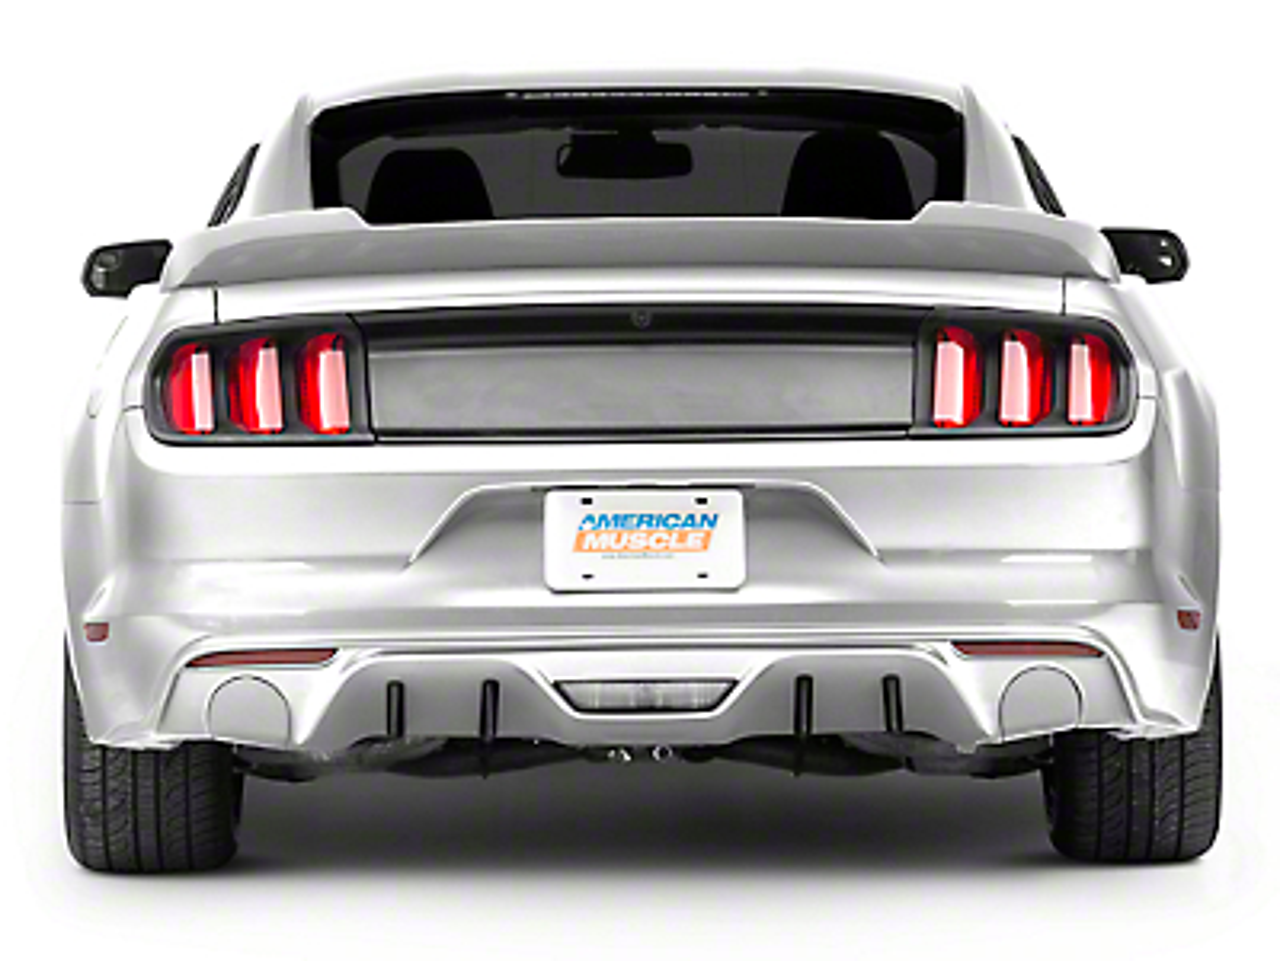 MMD Rear Diffuser Fins (15-17 GT, EcoBoost, V6 w/ Non-Premium Rear Bumper)